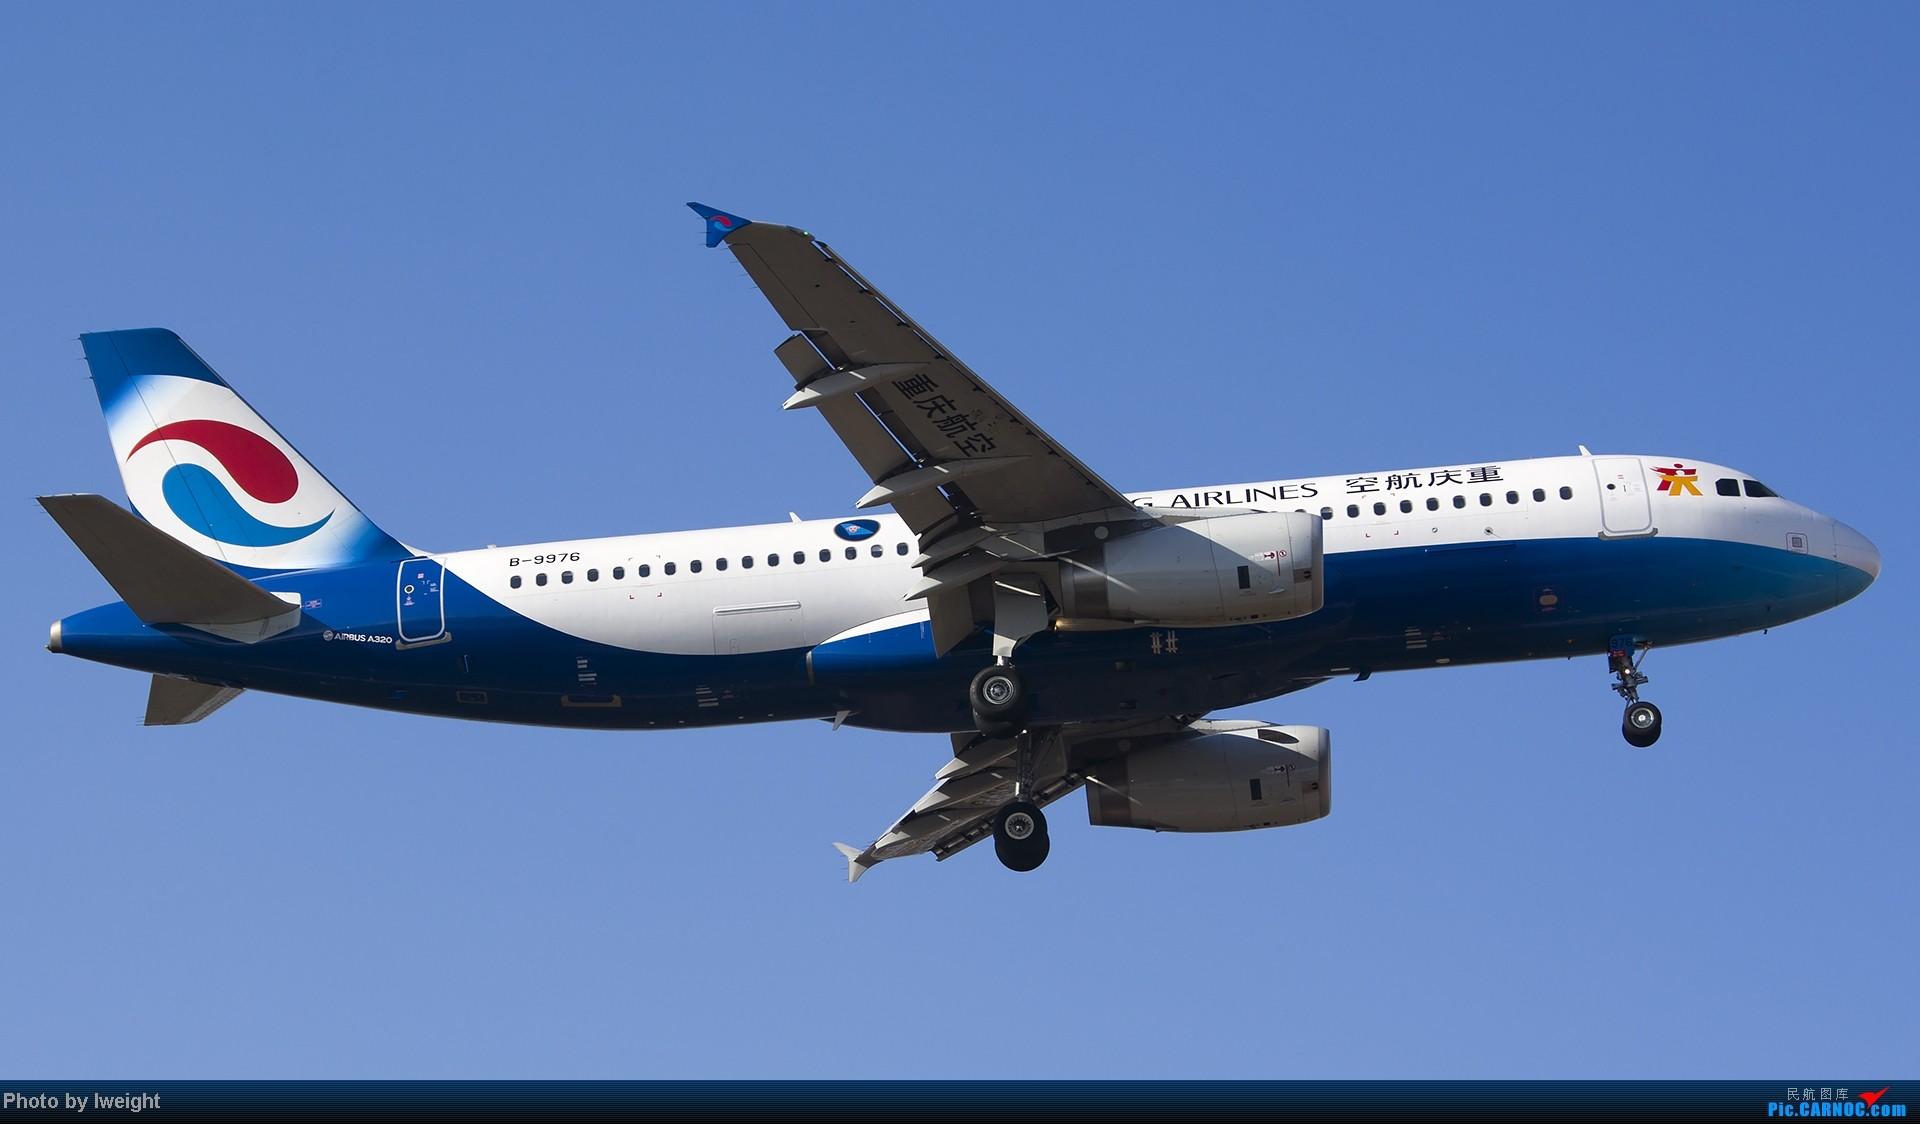 Re:[原创]抓住APEC蓝的尾巴,再拍上一组 AIRBUS A320-200 B-9976 中国北京首都机场